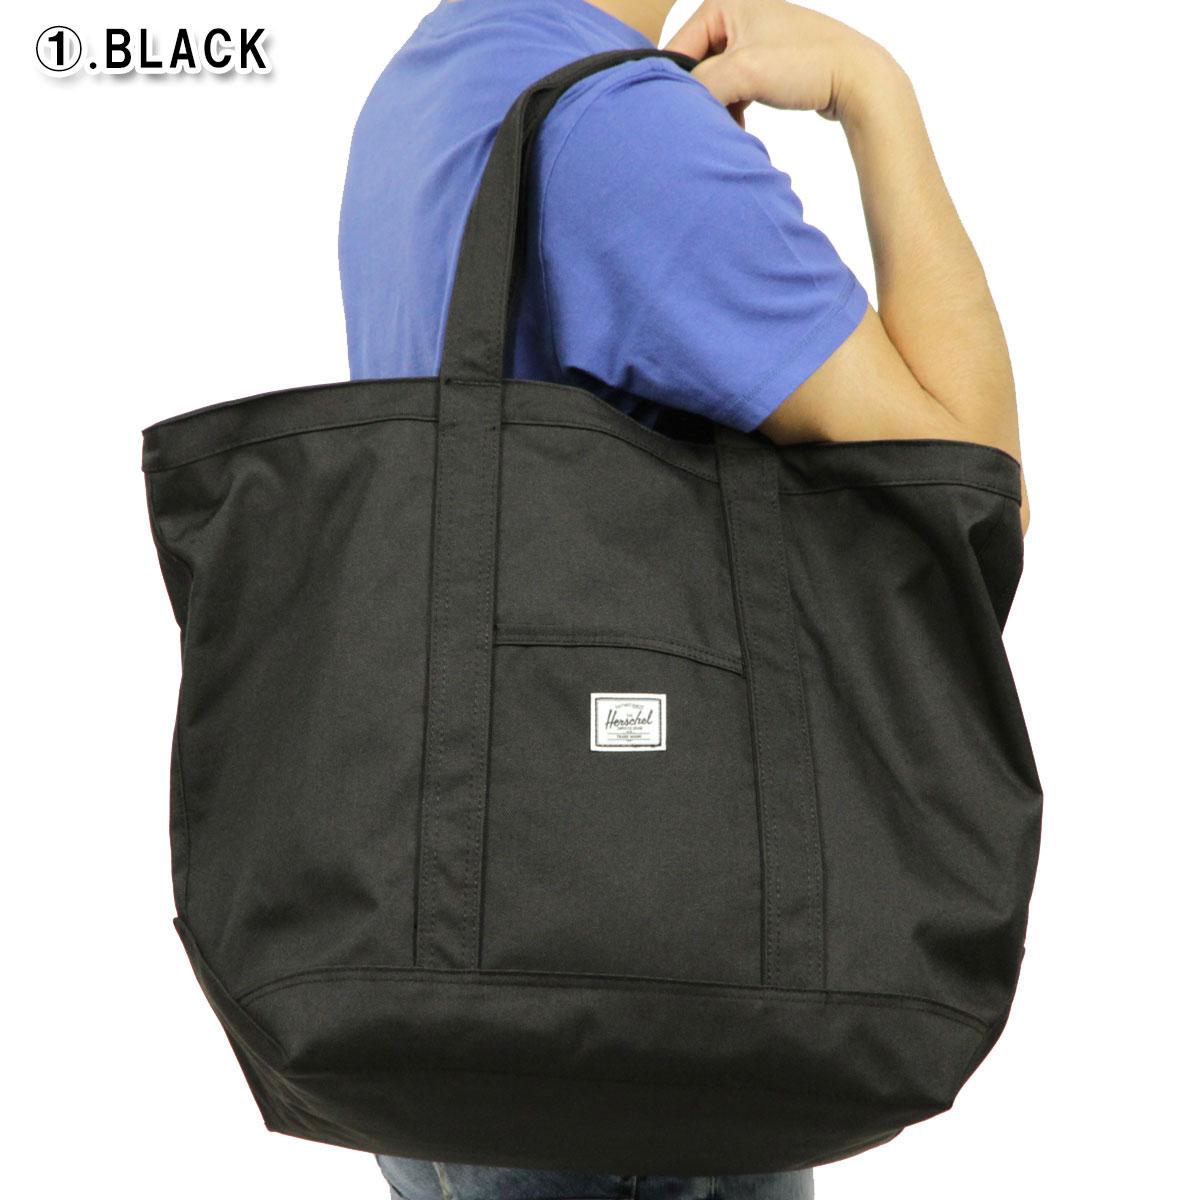 2da2602f9 Hershel supply Herschel Supply regular store bag tote bag BAMFIELD  MID-VOLUME TOTE BAG CLASSICS | TOTES 10318-OS